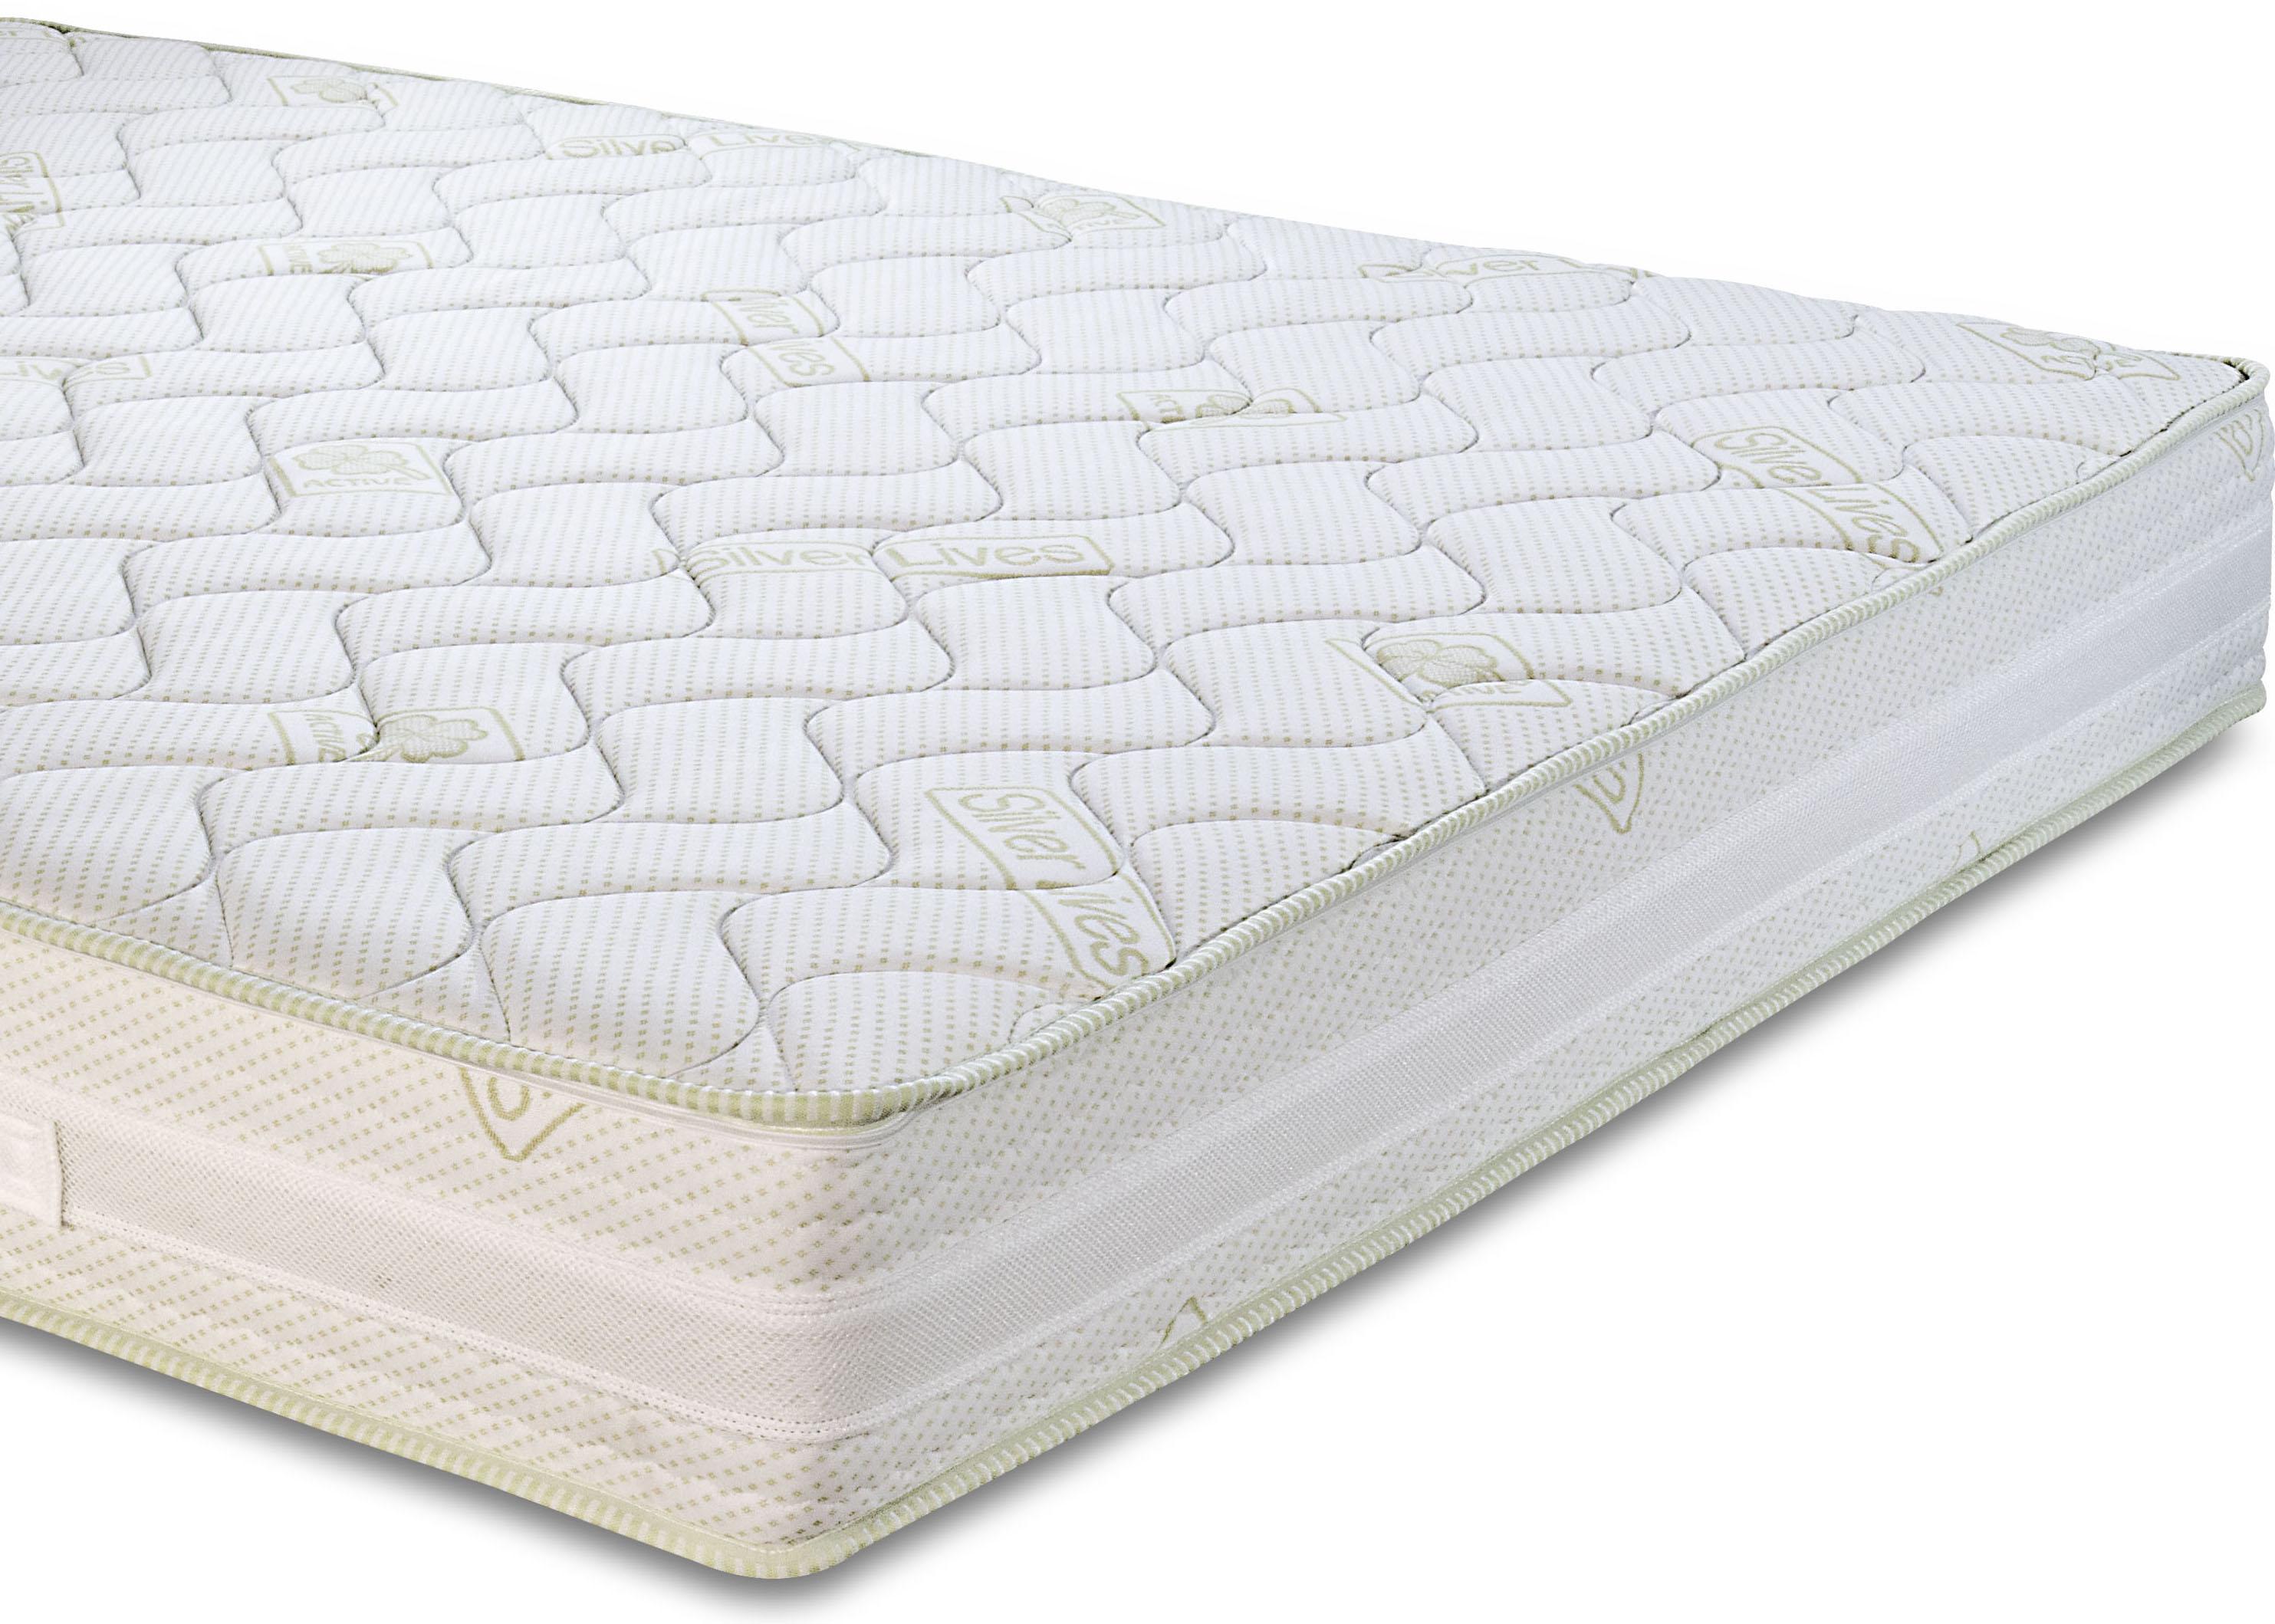 matelas en mousse a memoire de forme h 25 silver confort onda 4. Black Bedroom Furniture Sets. Home Design Ideas